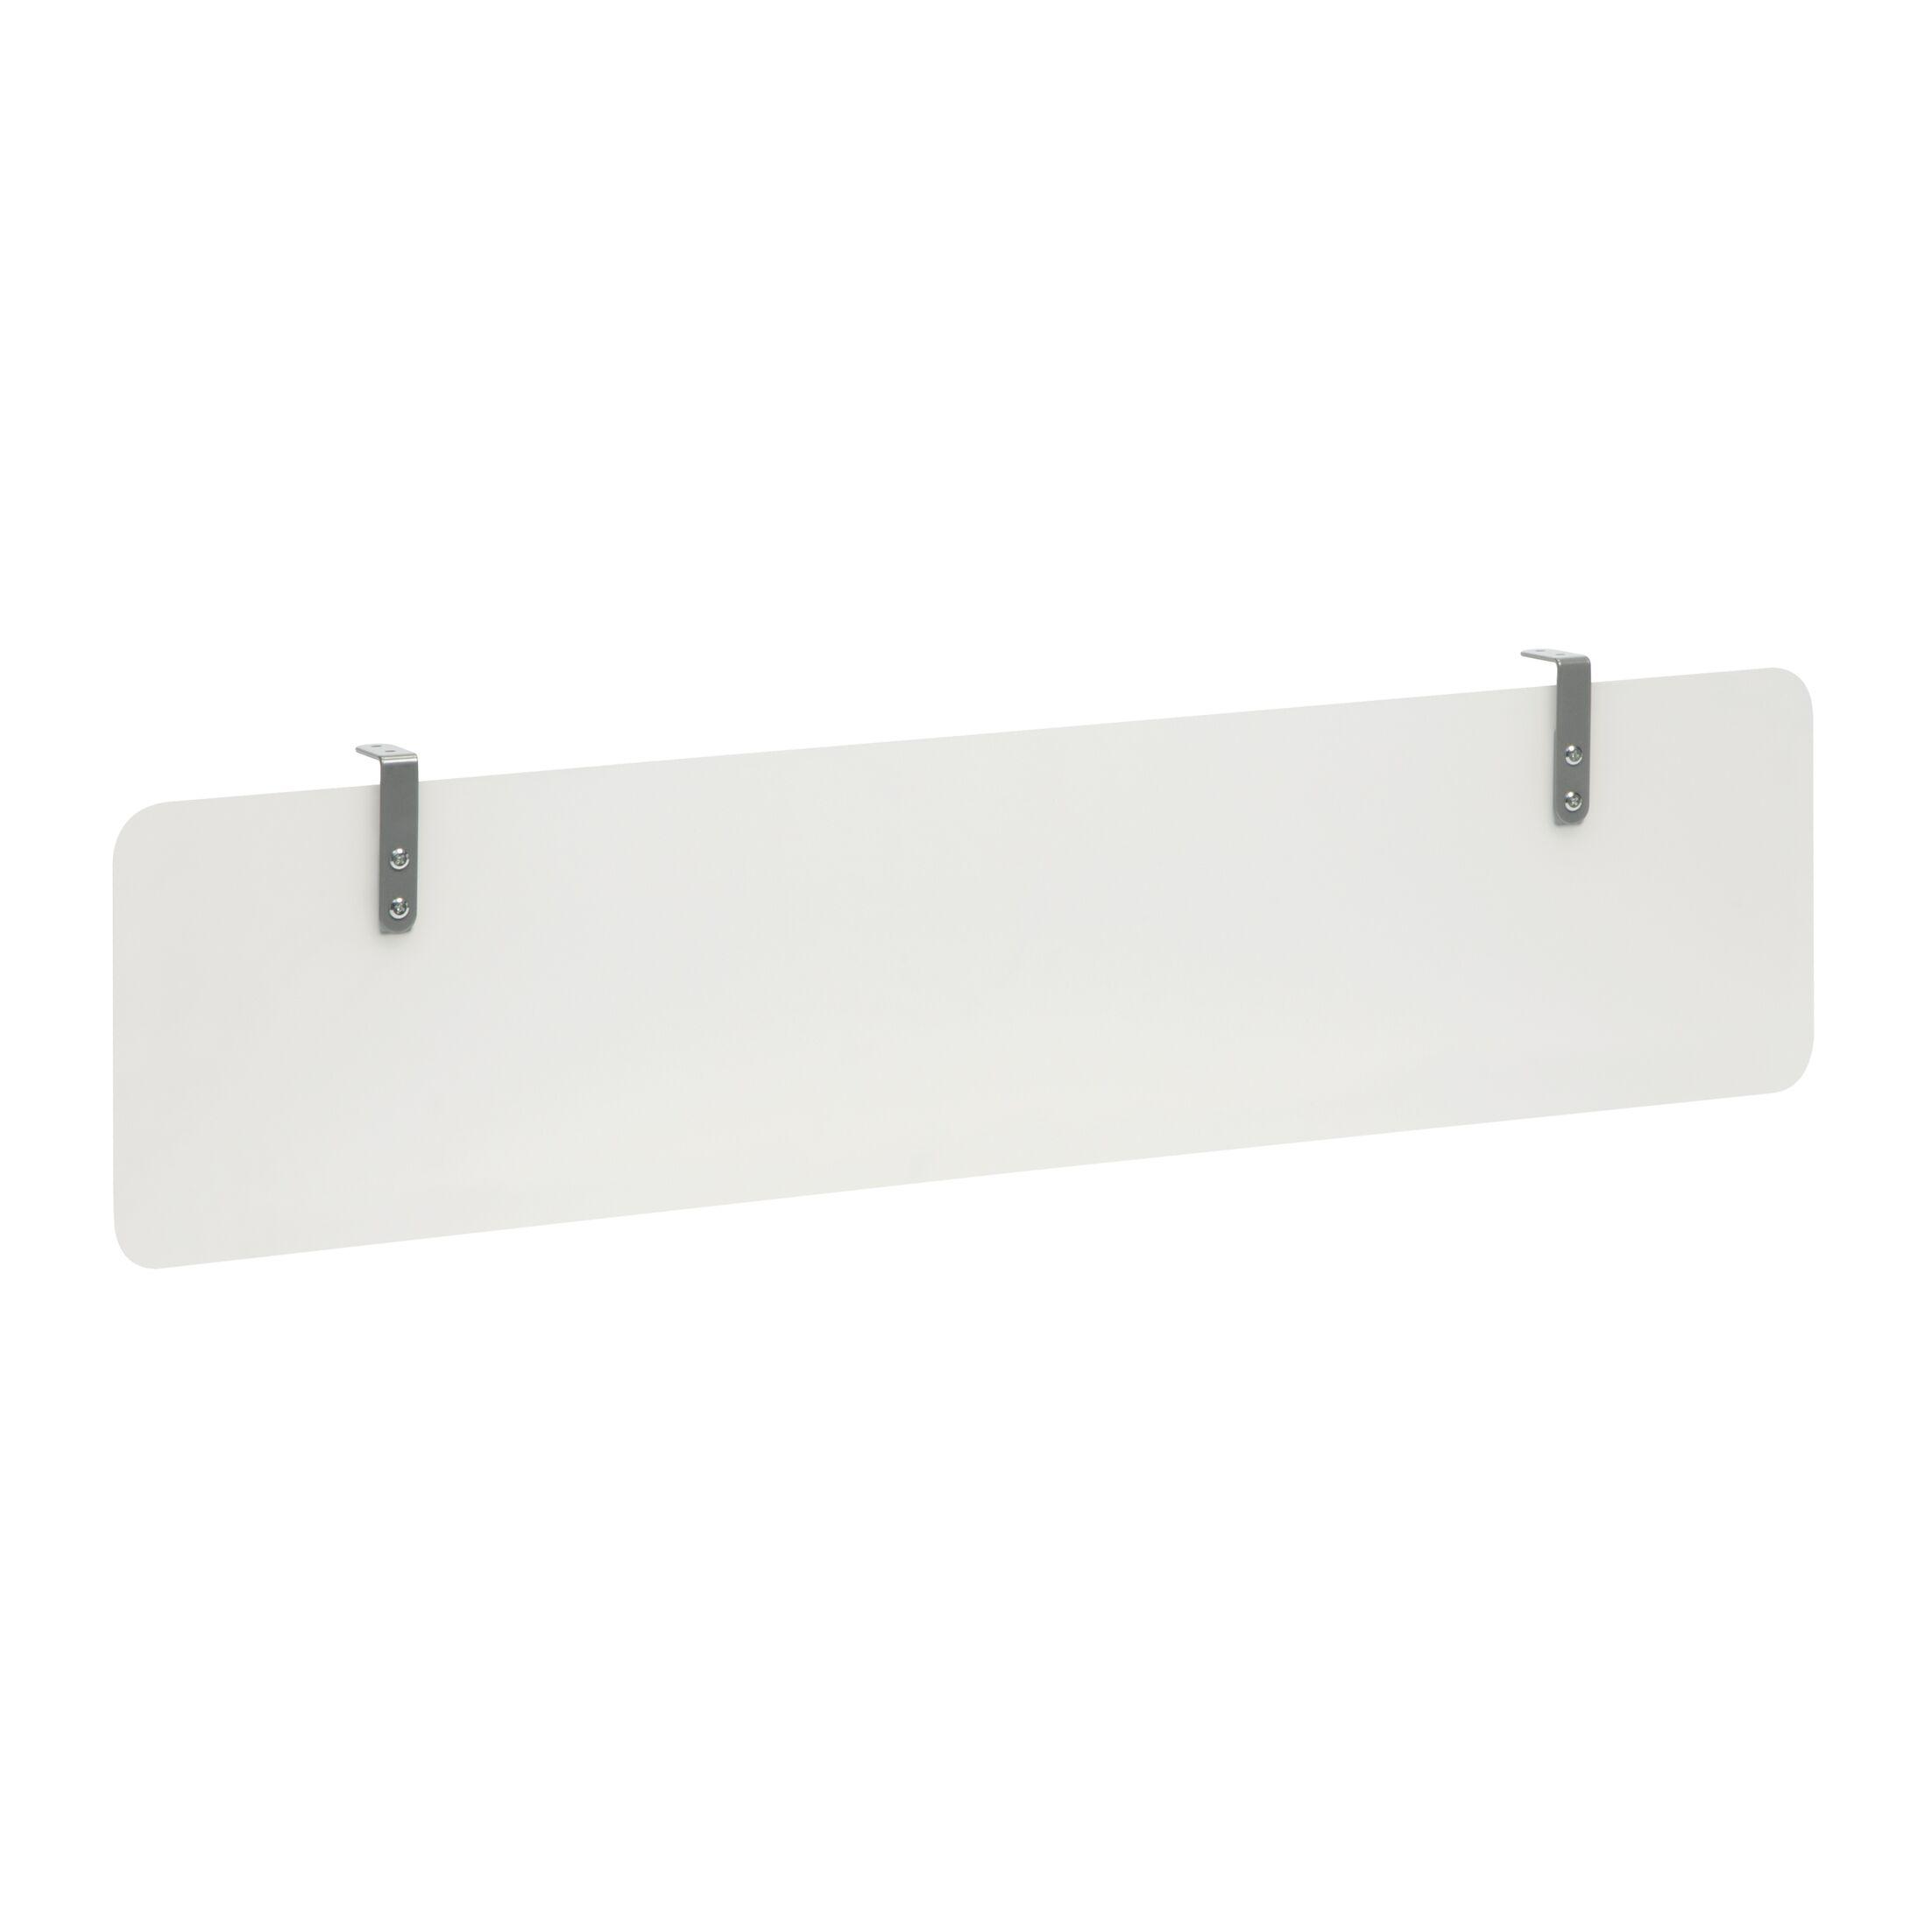 Gerth Plastic Modesty Desk Privacy Panel Size: 12